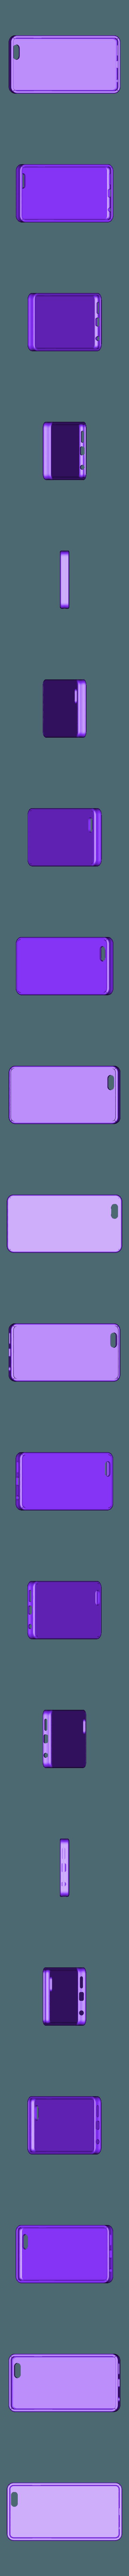 iphone6s_case_107_1piece_plain.stl Download free STL file iPhone6 case • Design to 3D print, tofuji